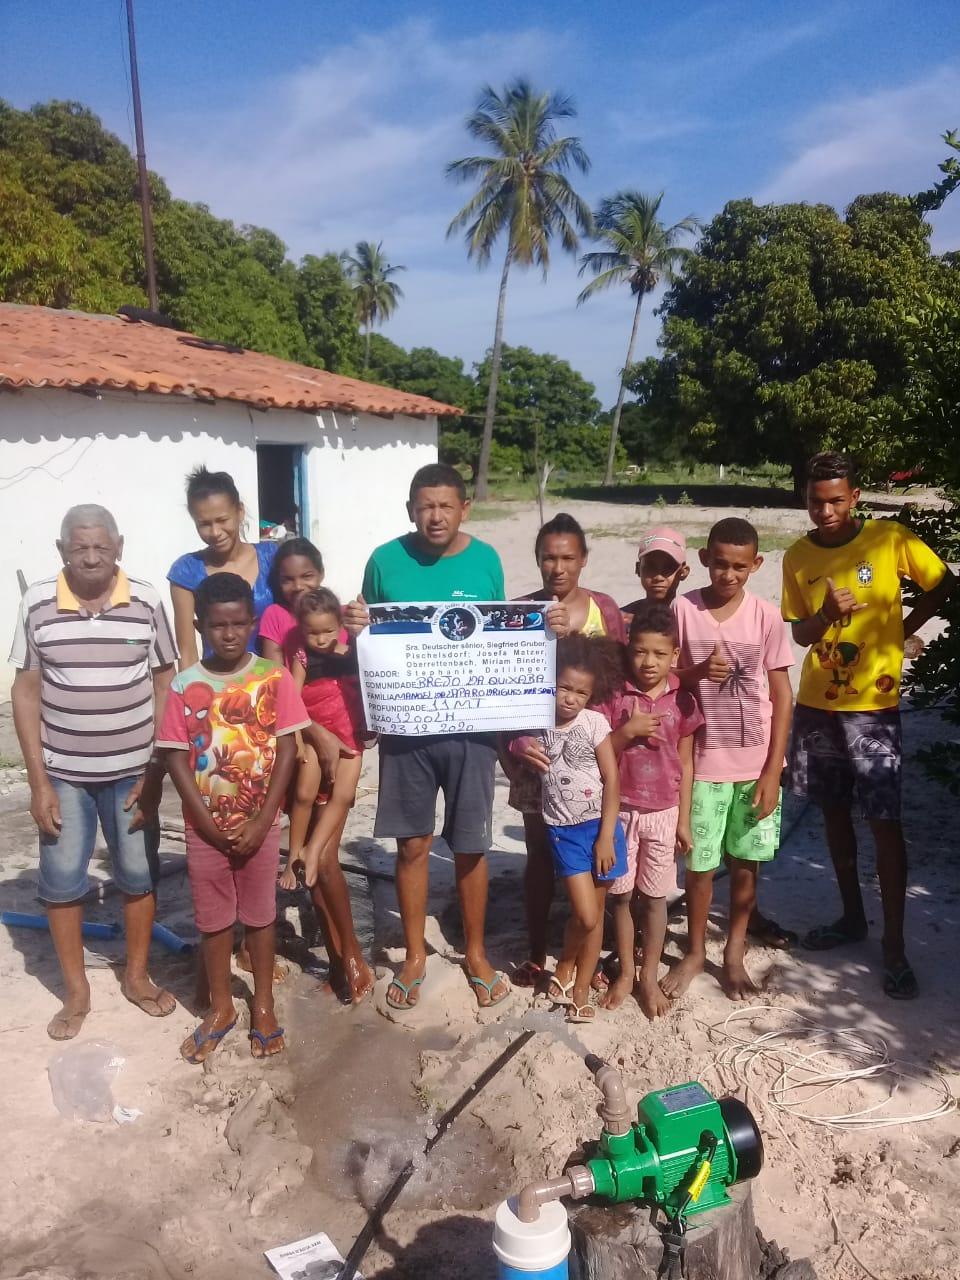 2020-12-23 Bahia - Image 1